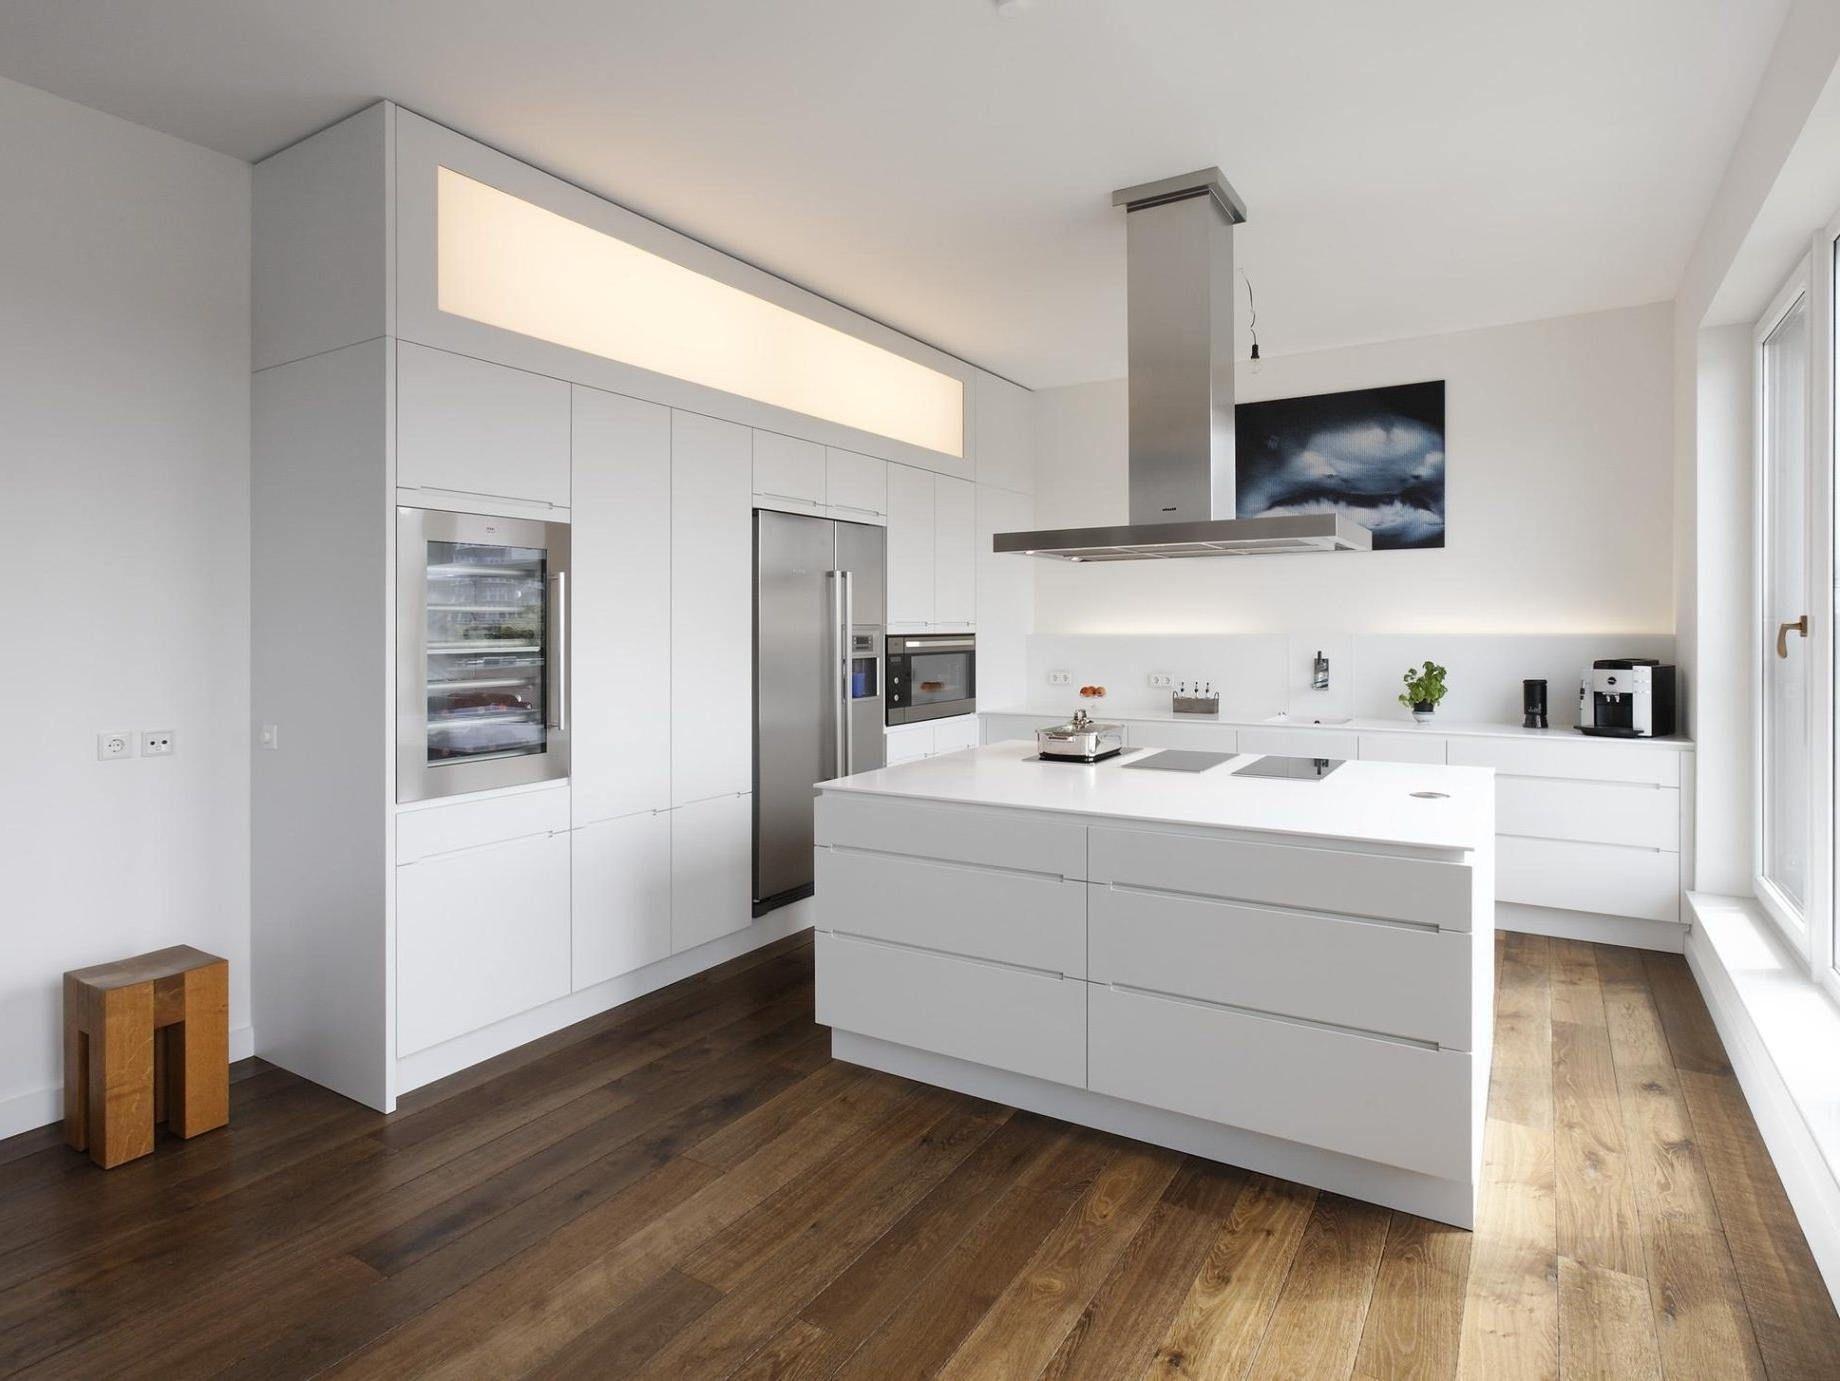 Outstanding modern kitchen lighting ideas plus fluorescent light